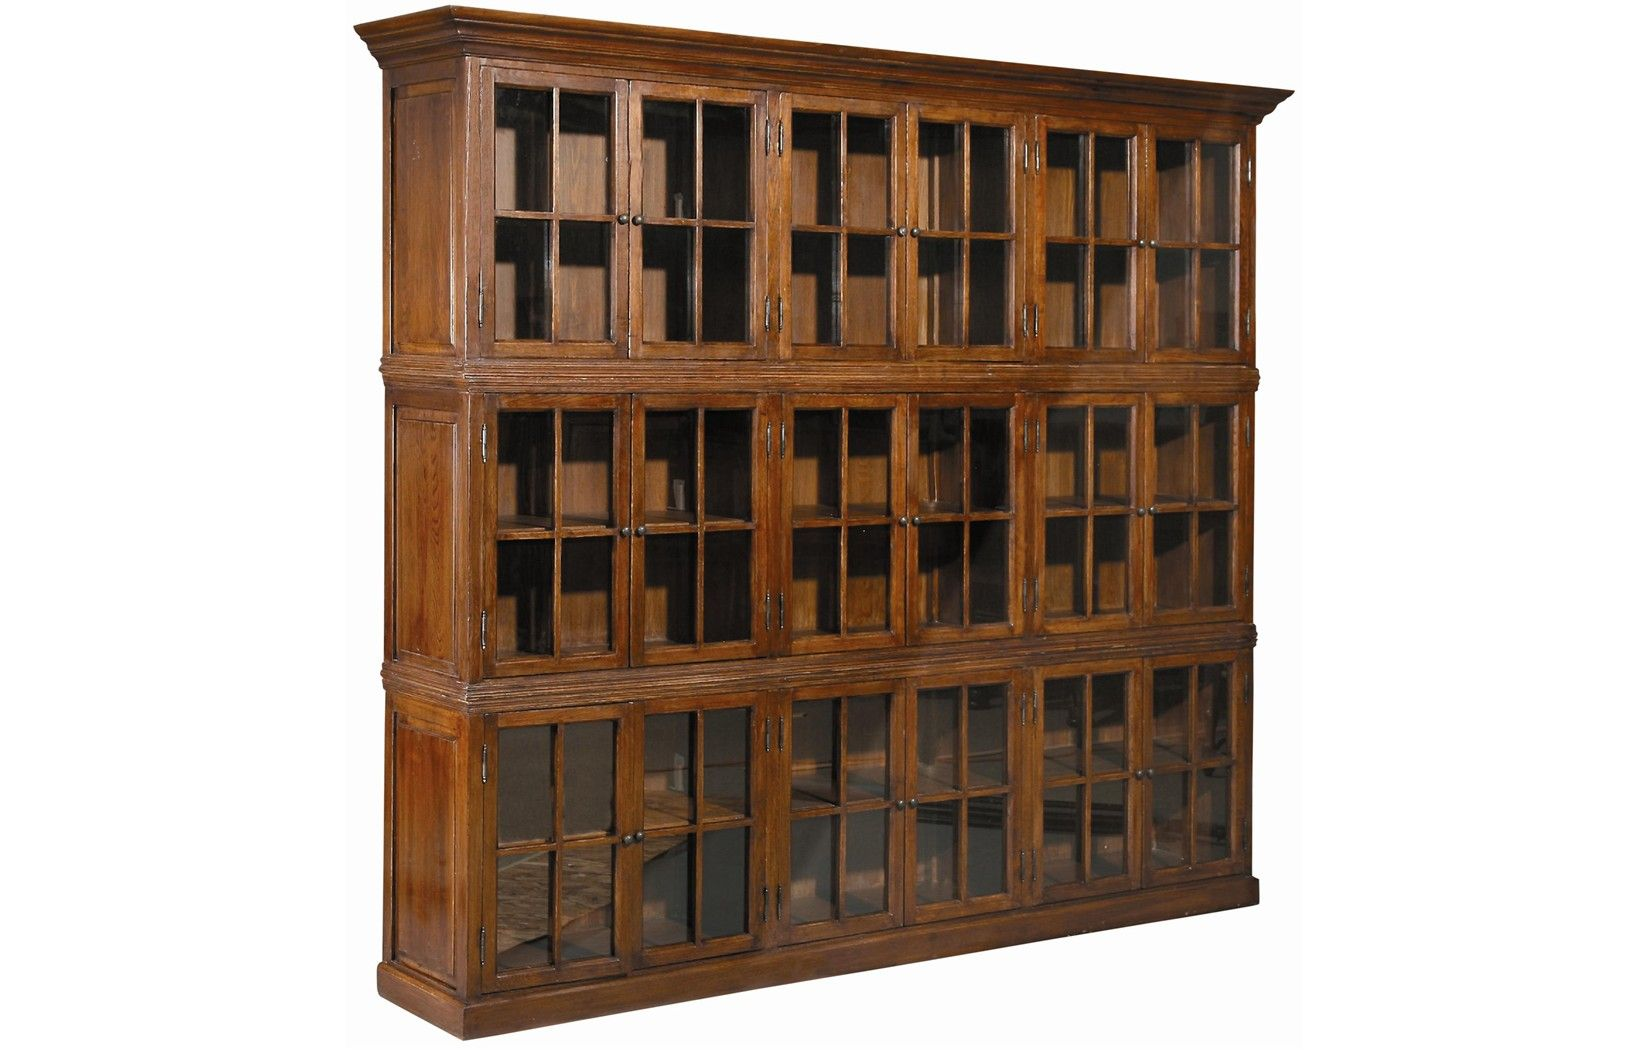 Triple Stack Manor Bookcase Nine Sets Of Mullion Framed Gl Doors Display Three Removable Shelves In